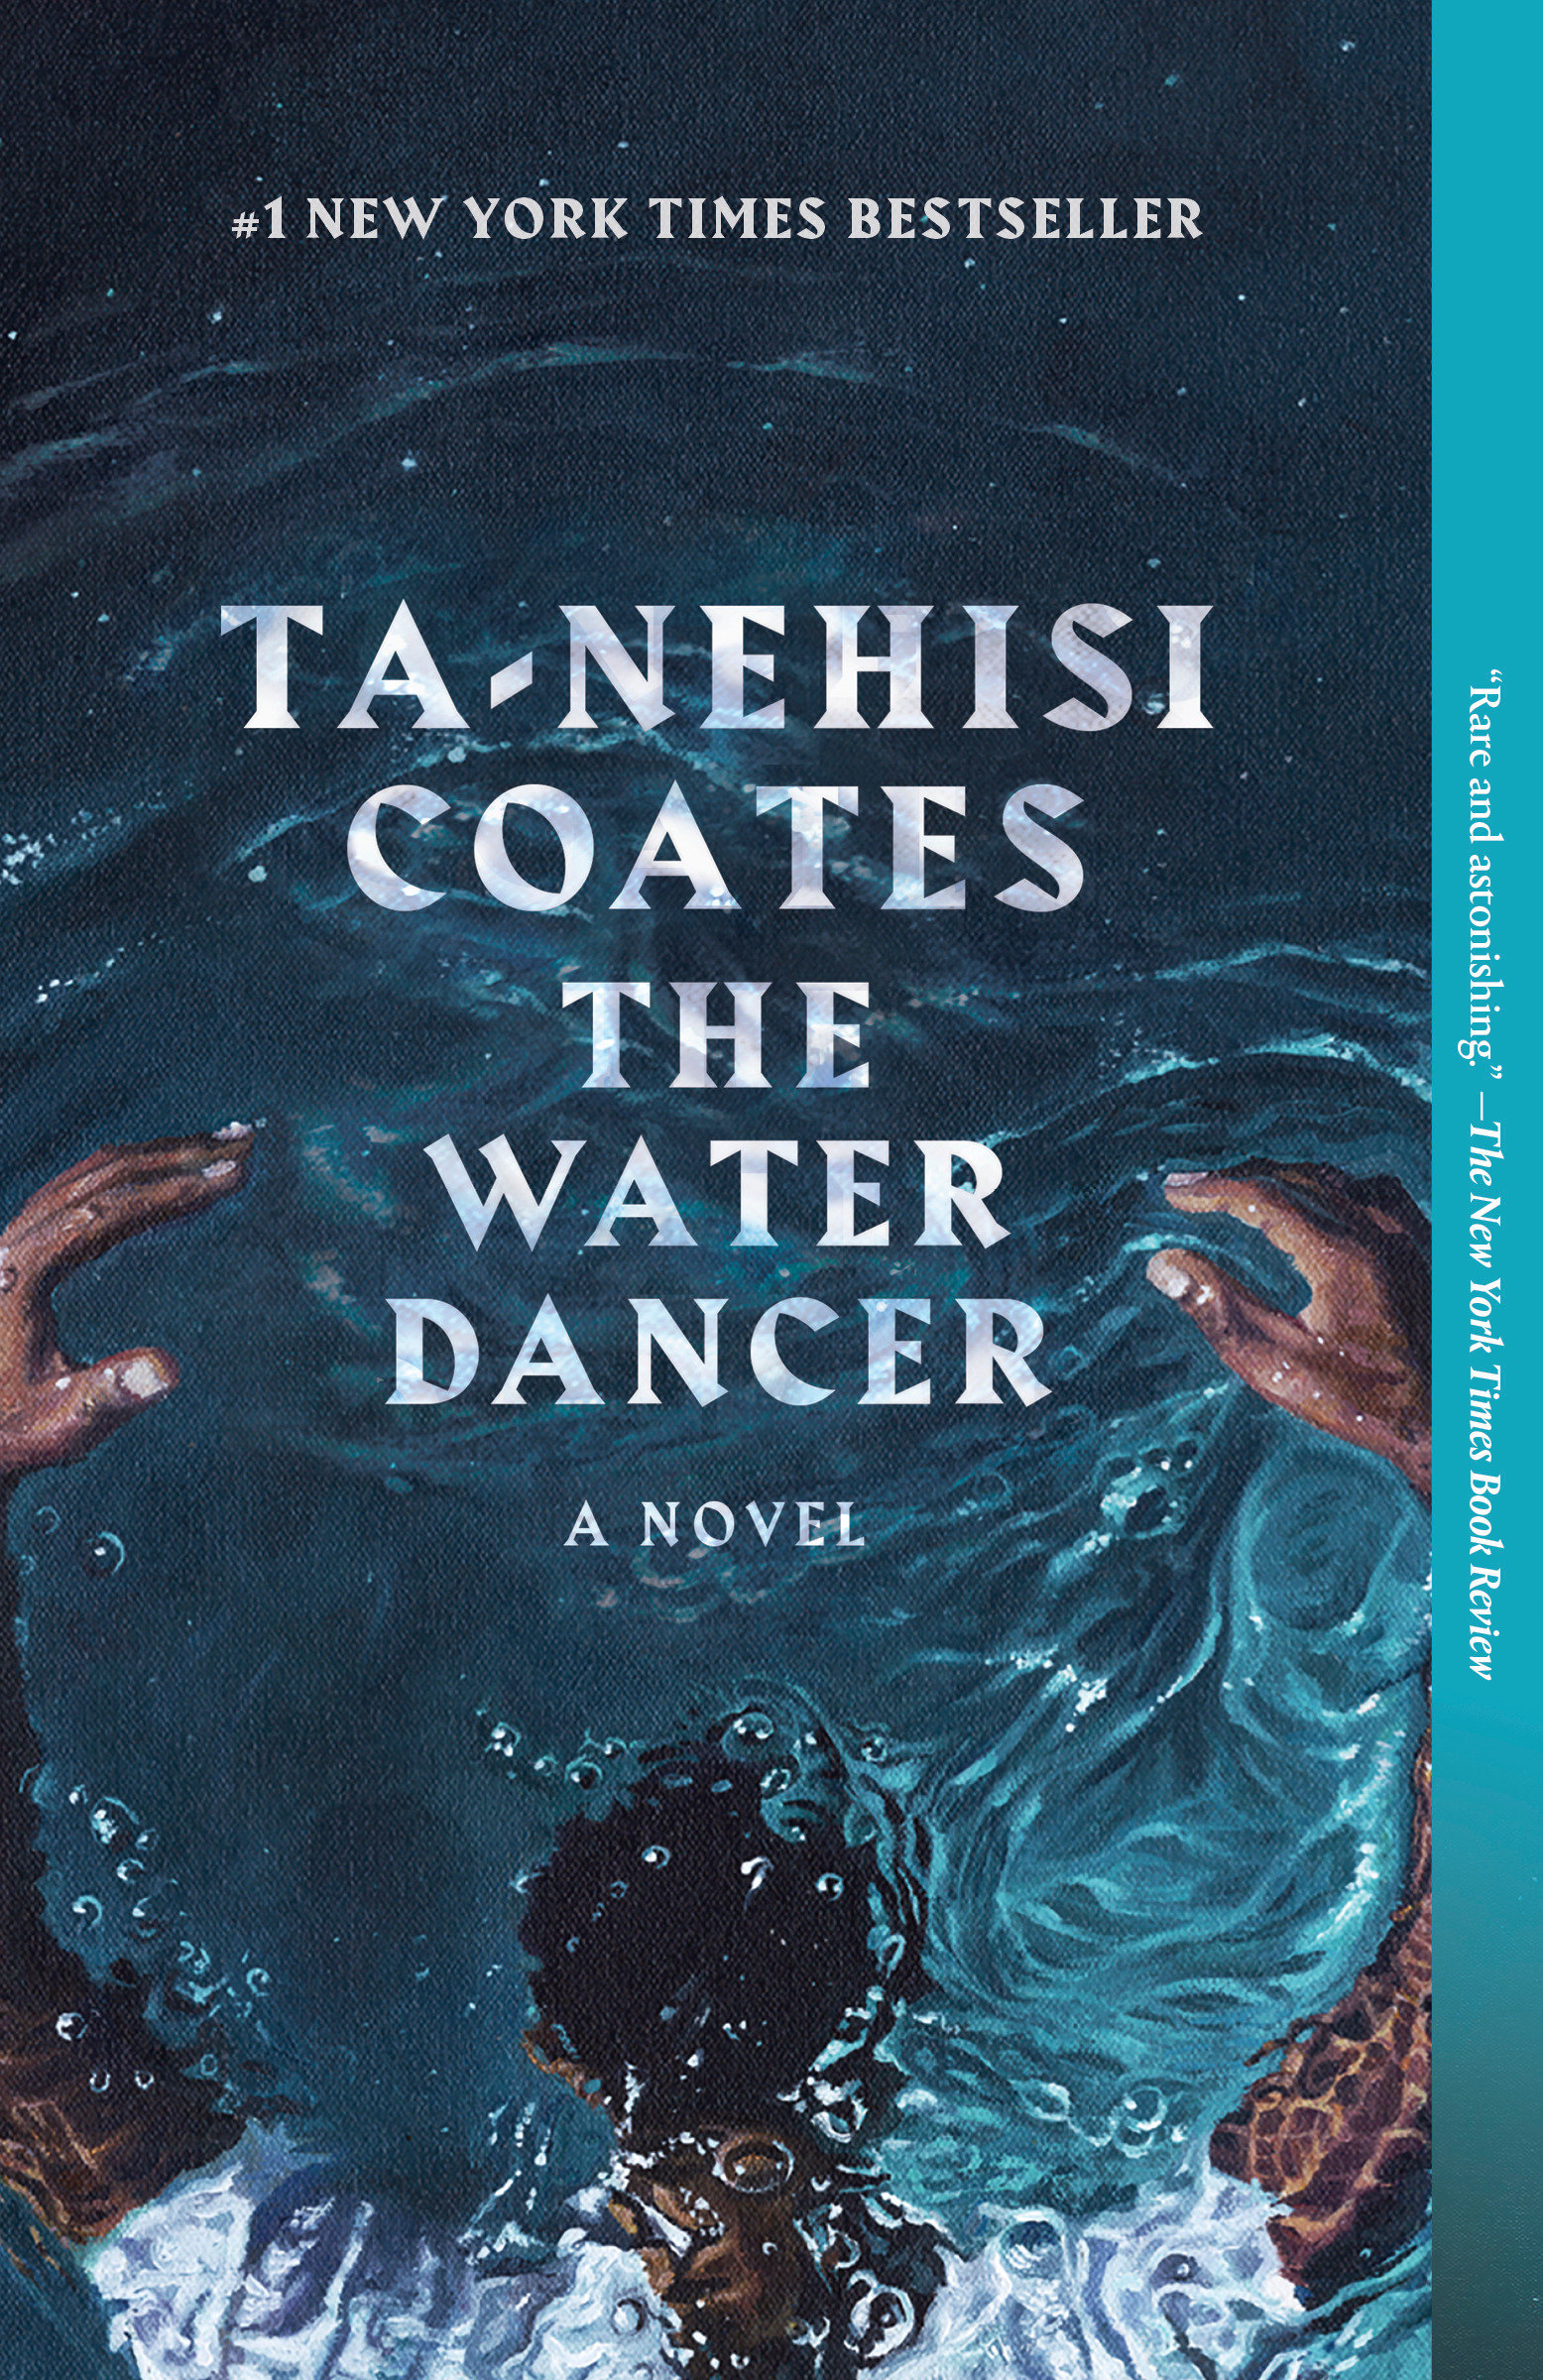 The Water Dancer (Oprah's Book Club) A Novel